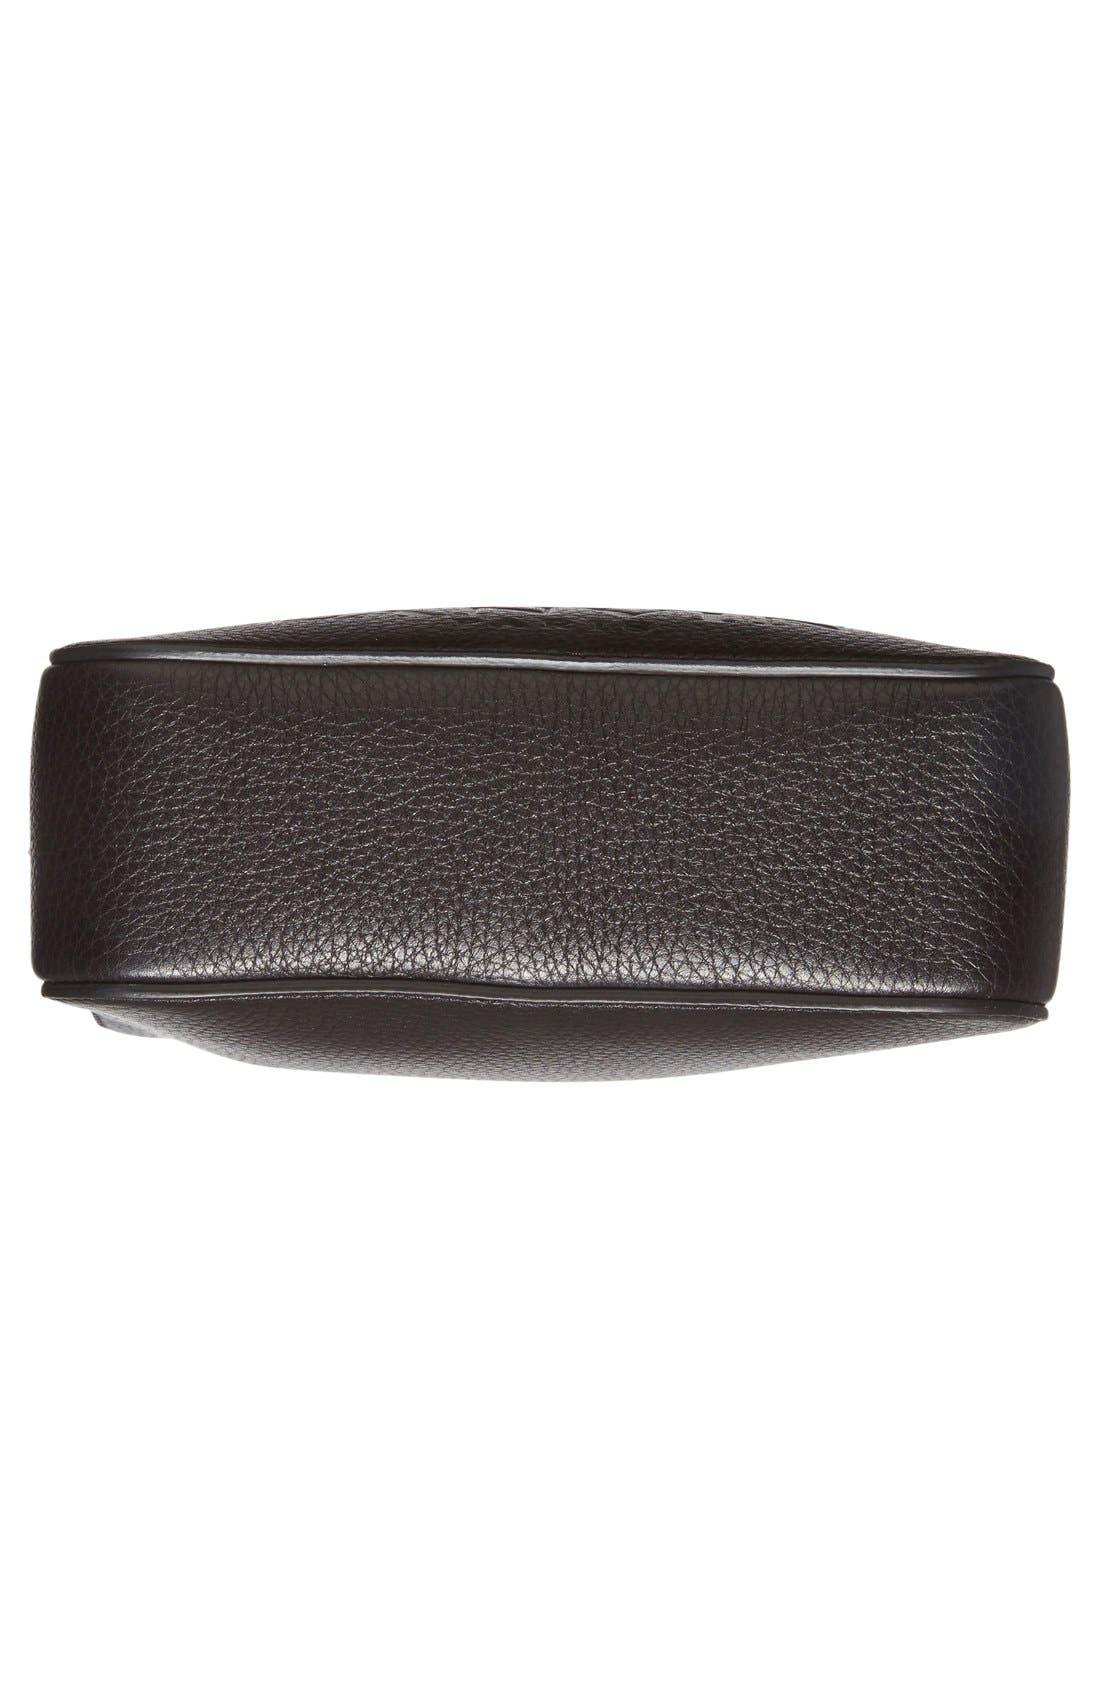 'Nomad' Leather Camera Bag,                             Alternate thumbnail 6, color,                             001